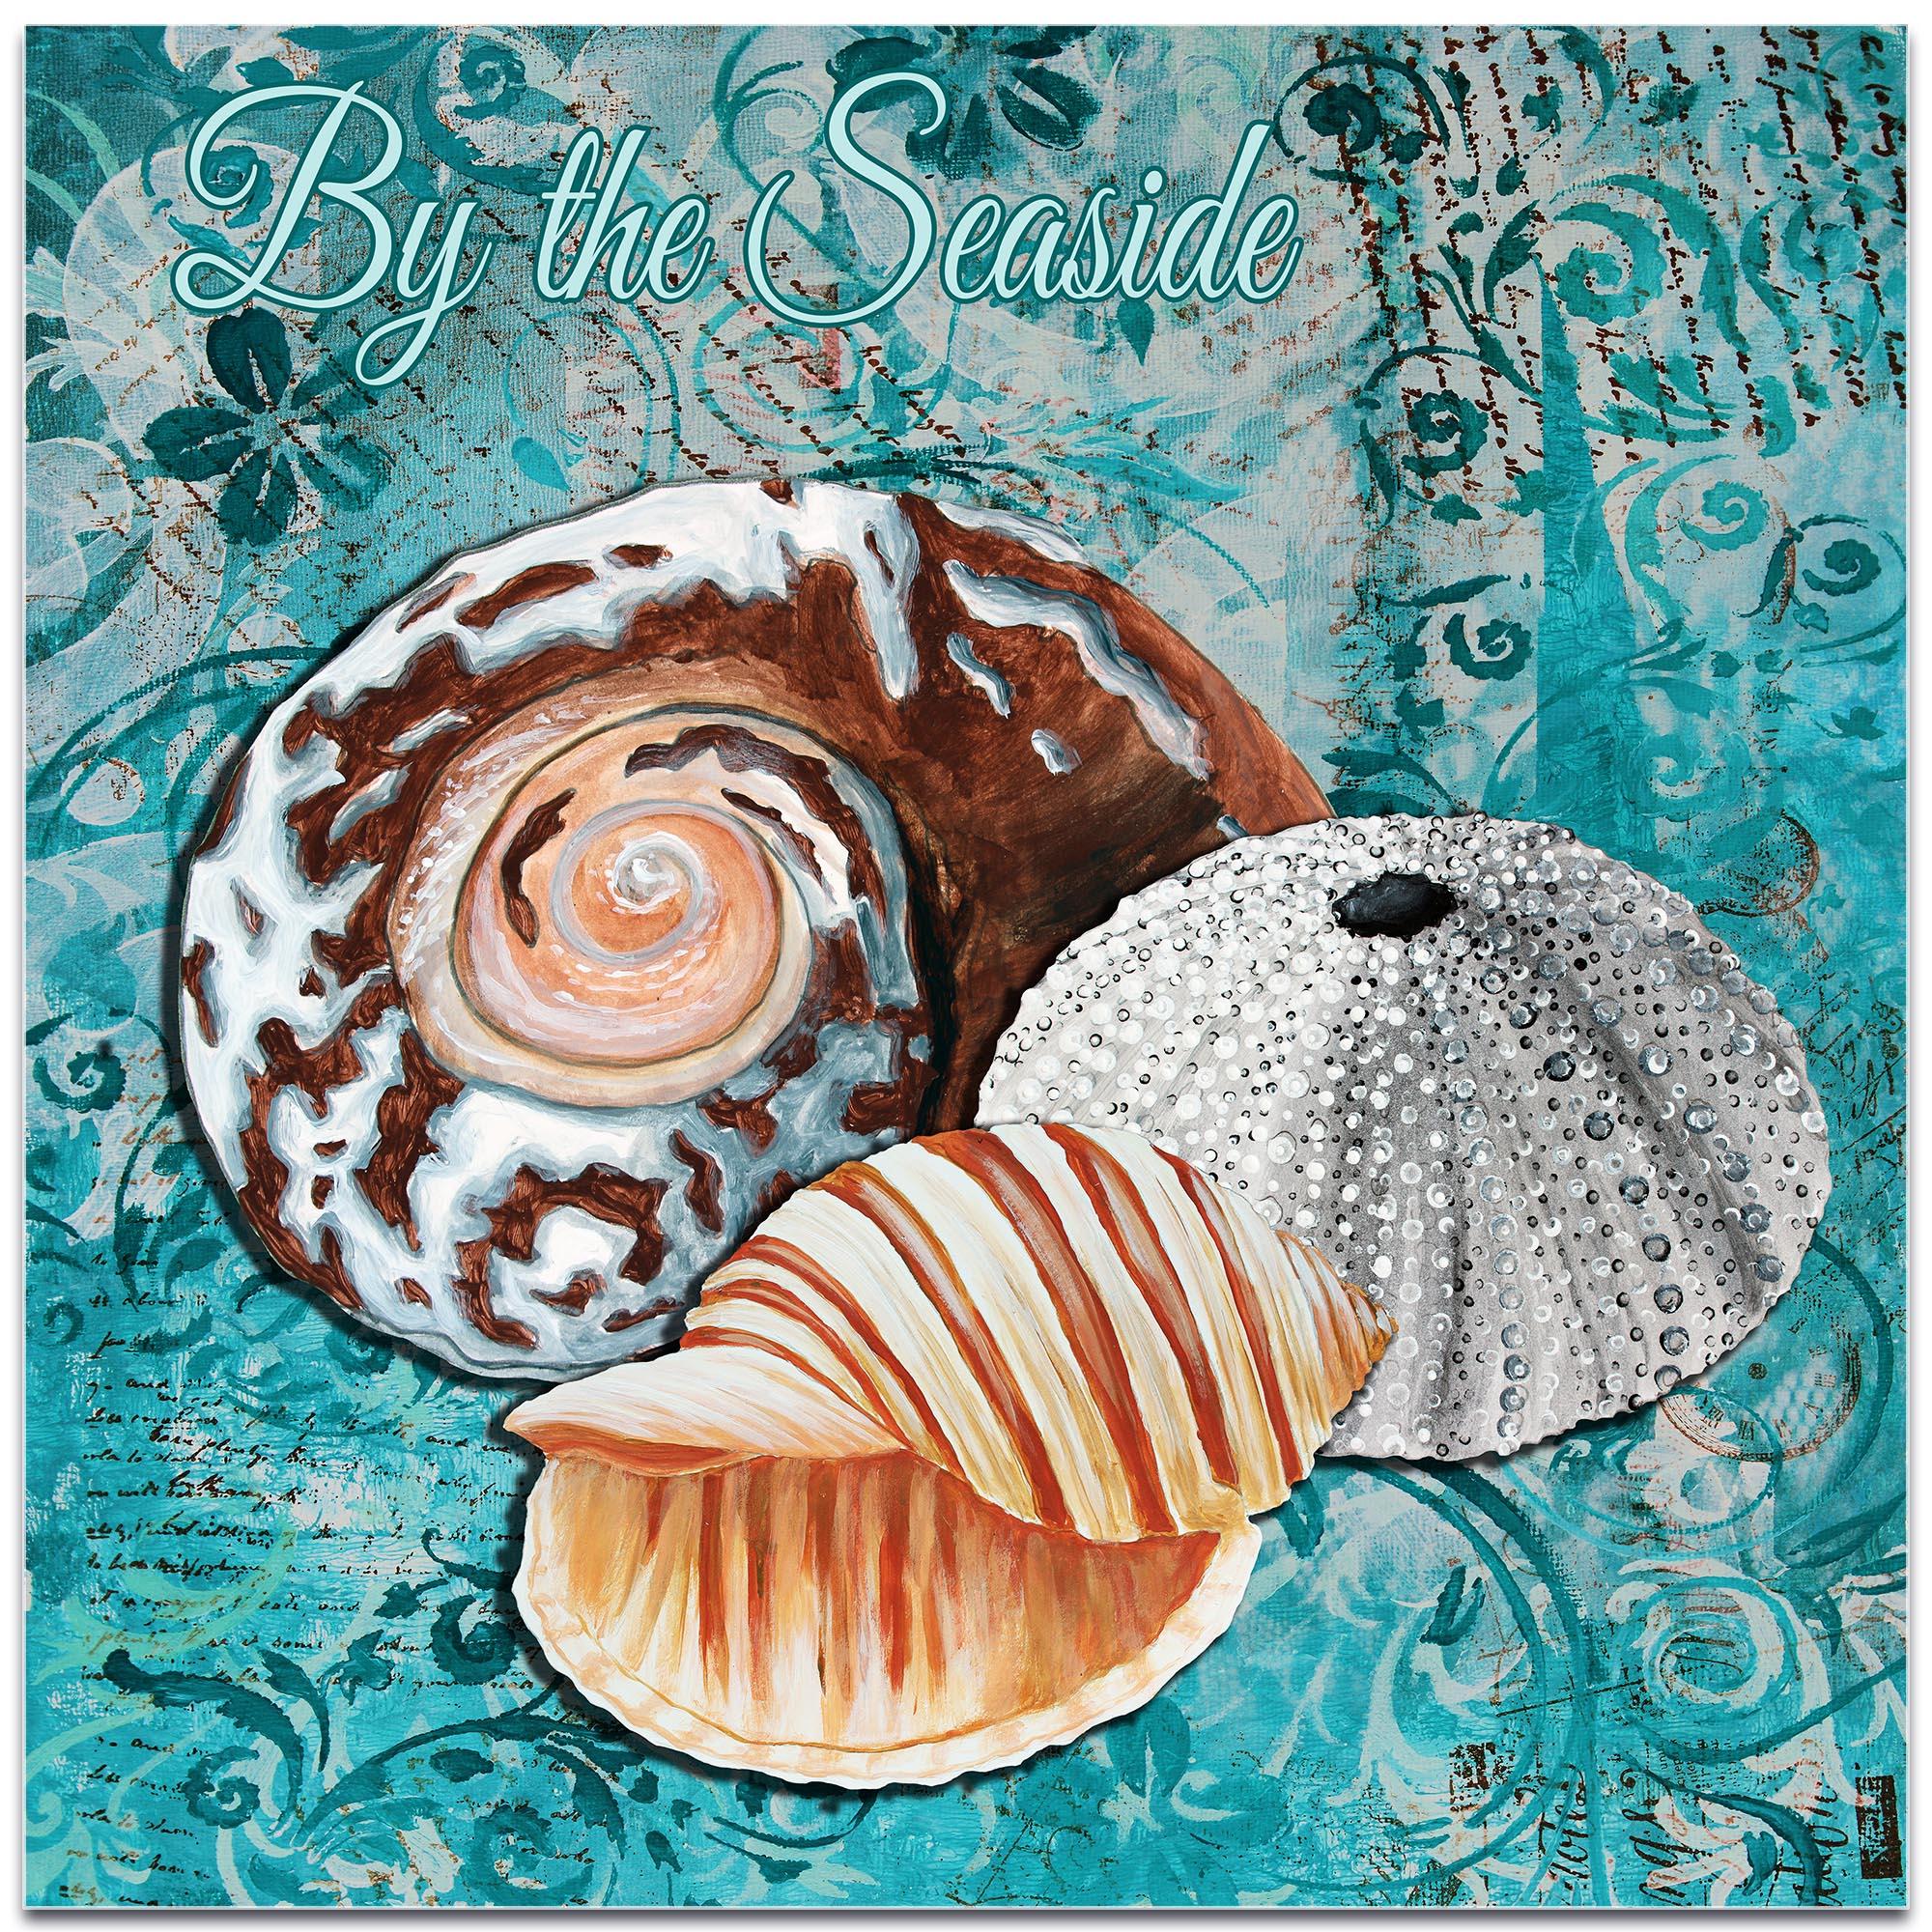 Beach Decor 'By the Seaside' - Coastal Bathroom Art on Metal or Acrylic - Image 2